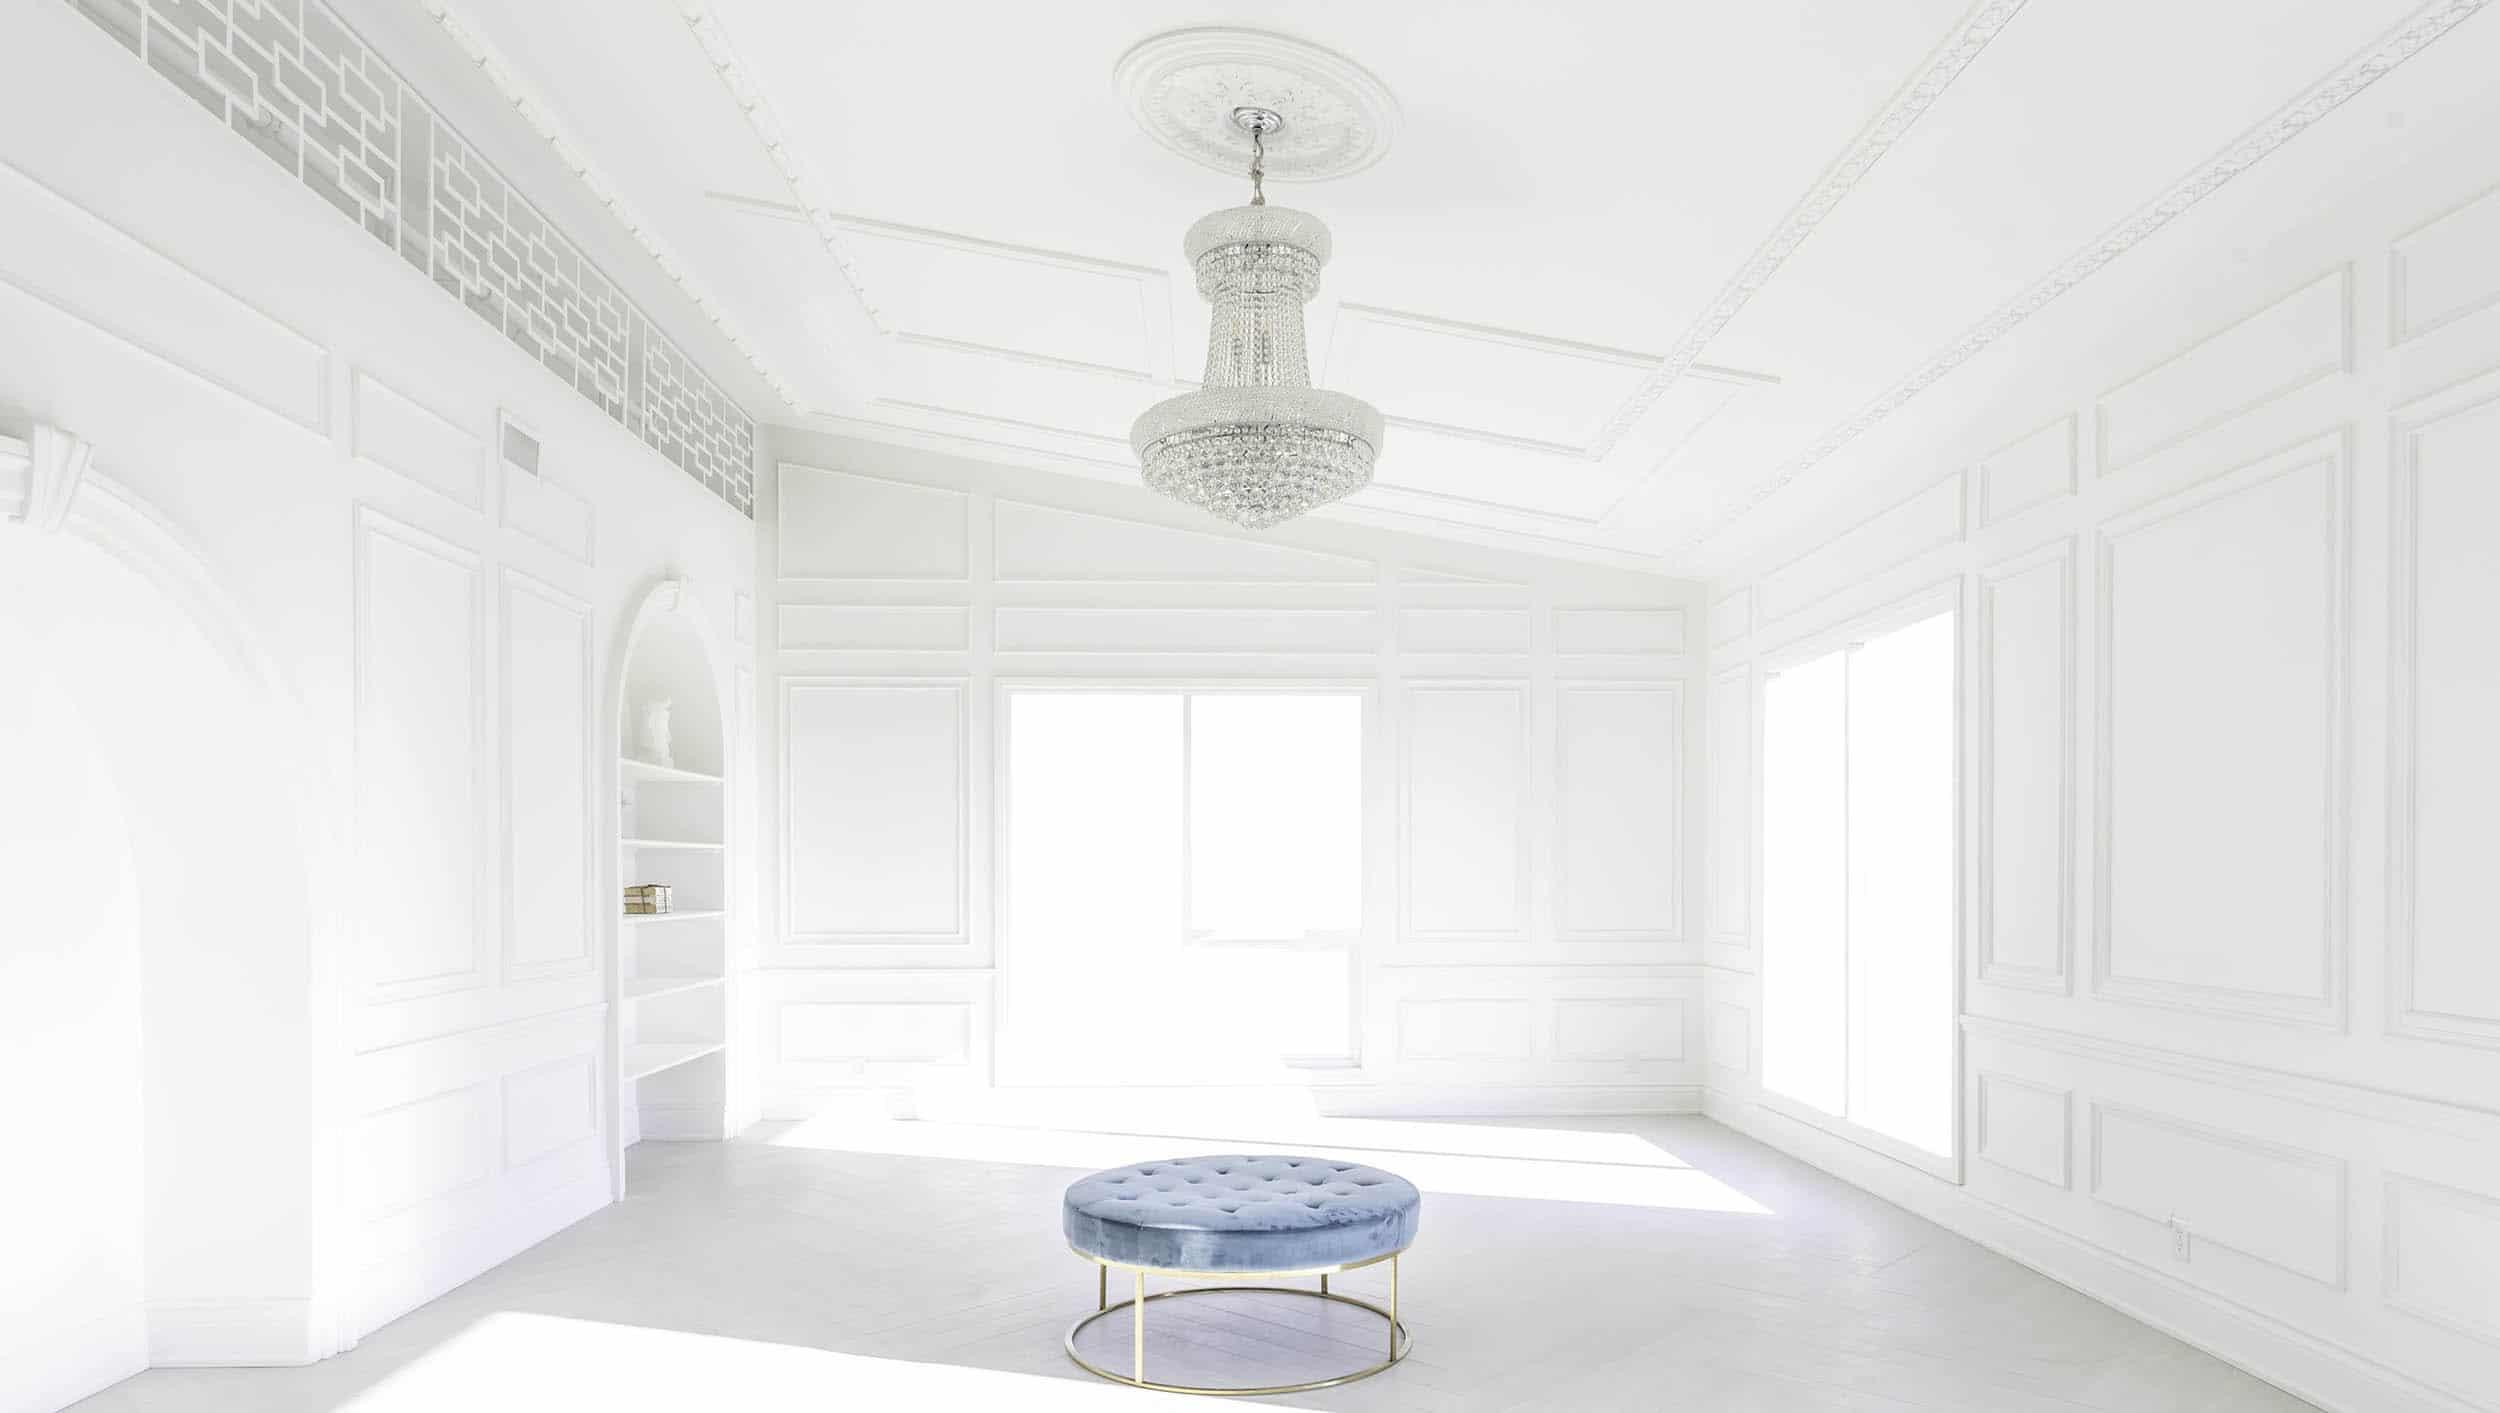 Mint Room's White Loft